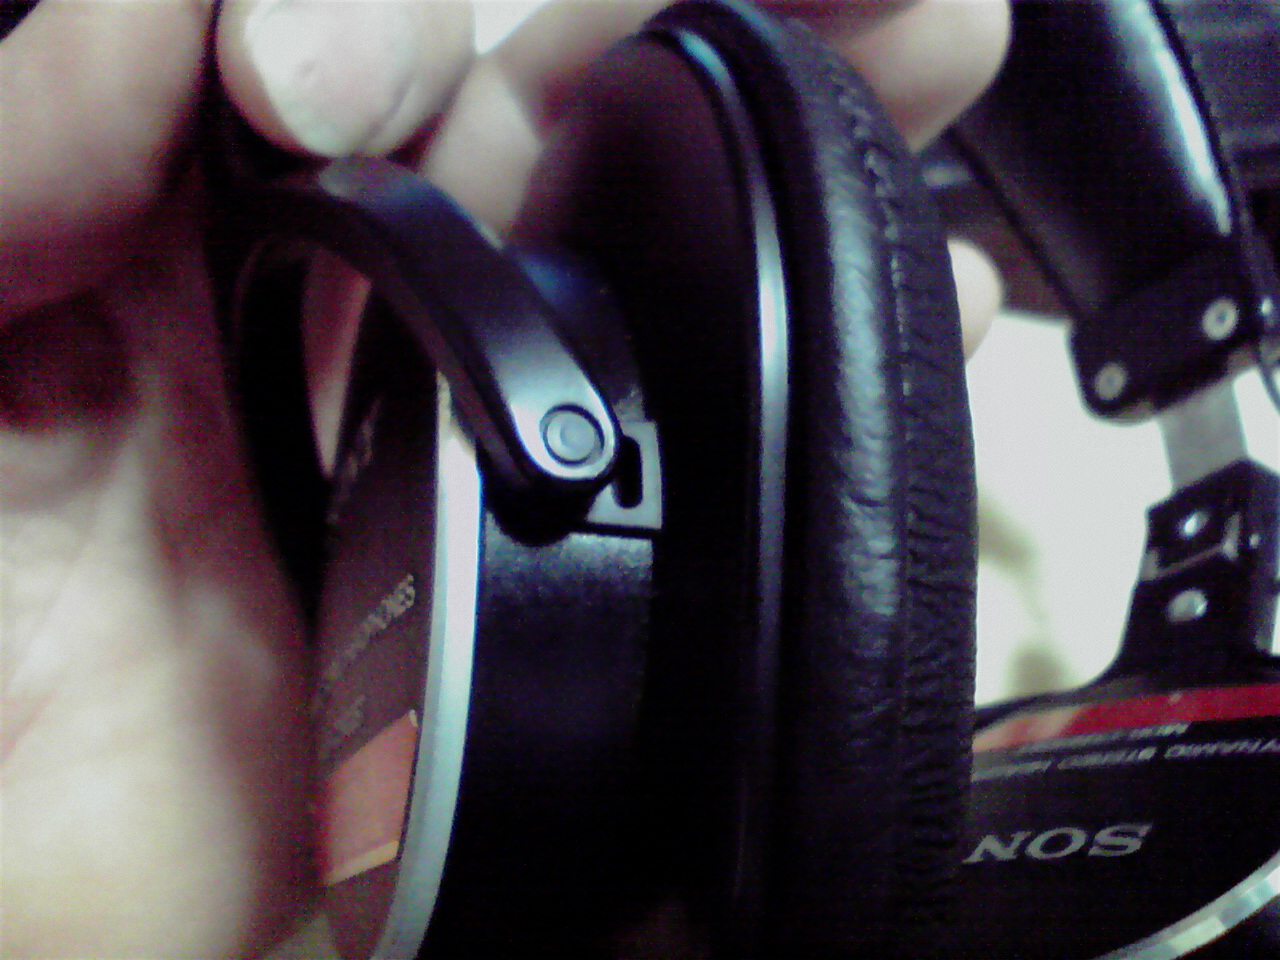 MDR-CD900ST 02